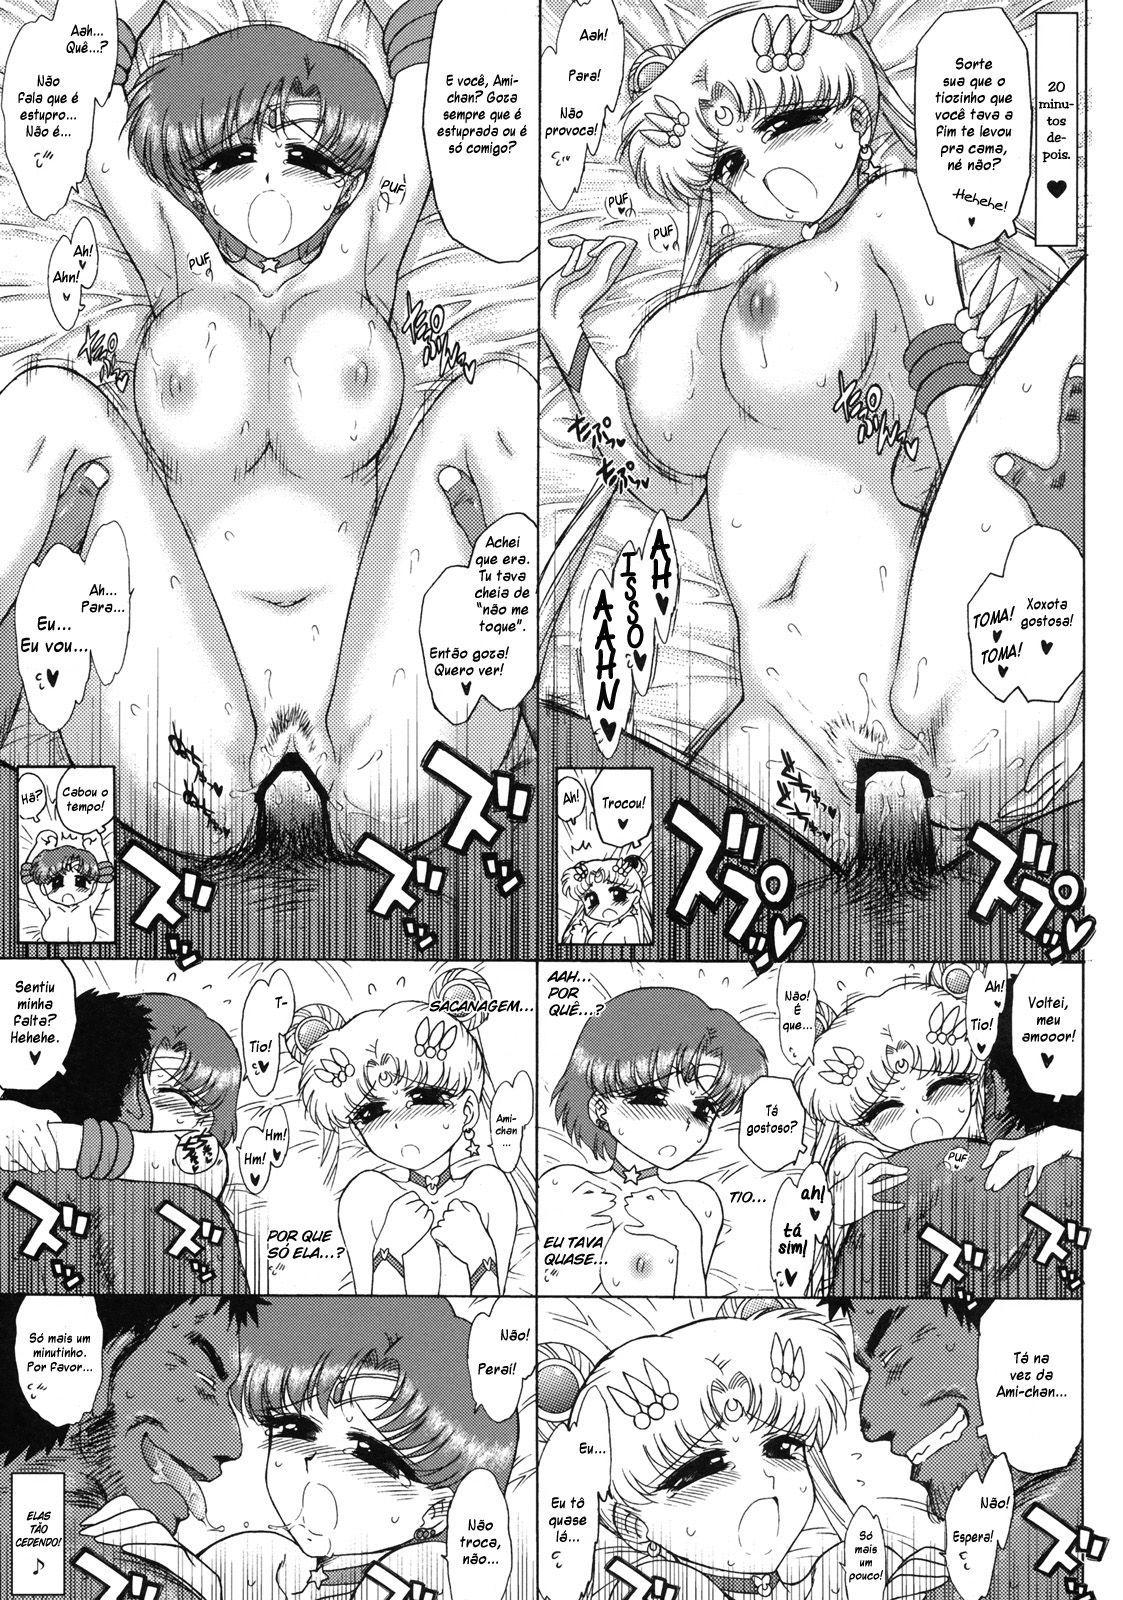 Sailor Moon Hentai – No esconderijo dos Youmas